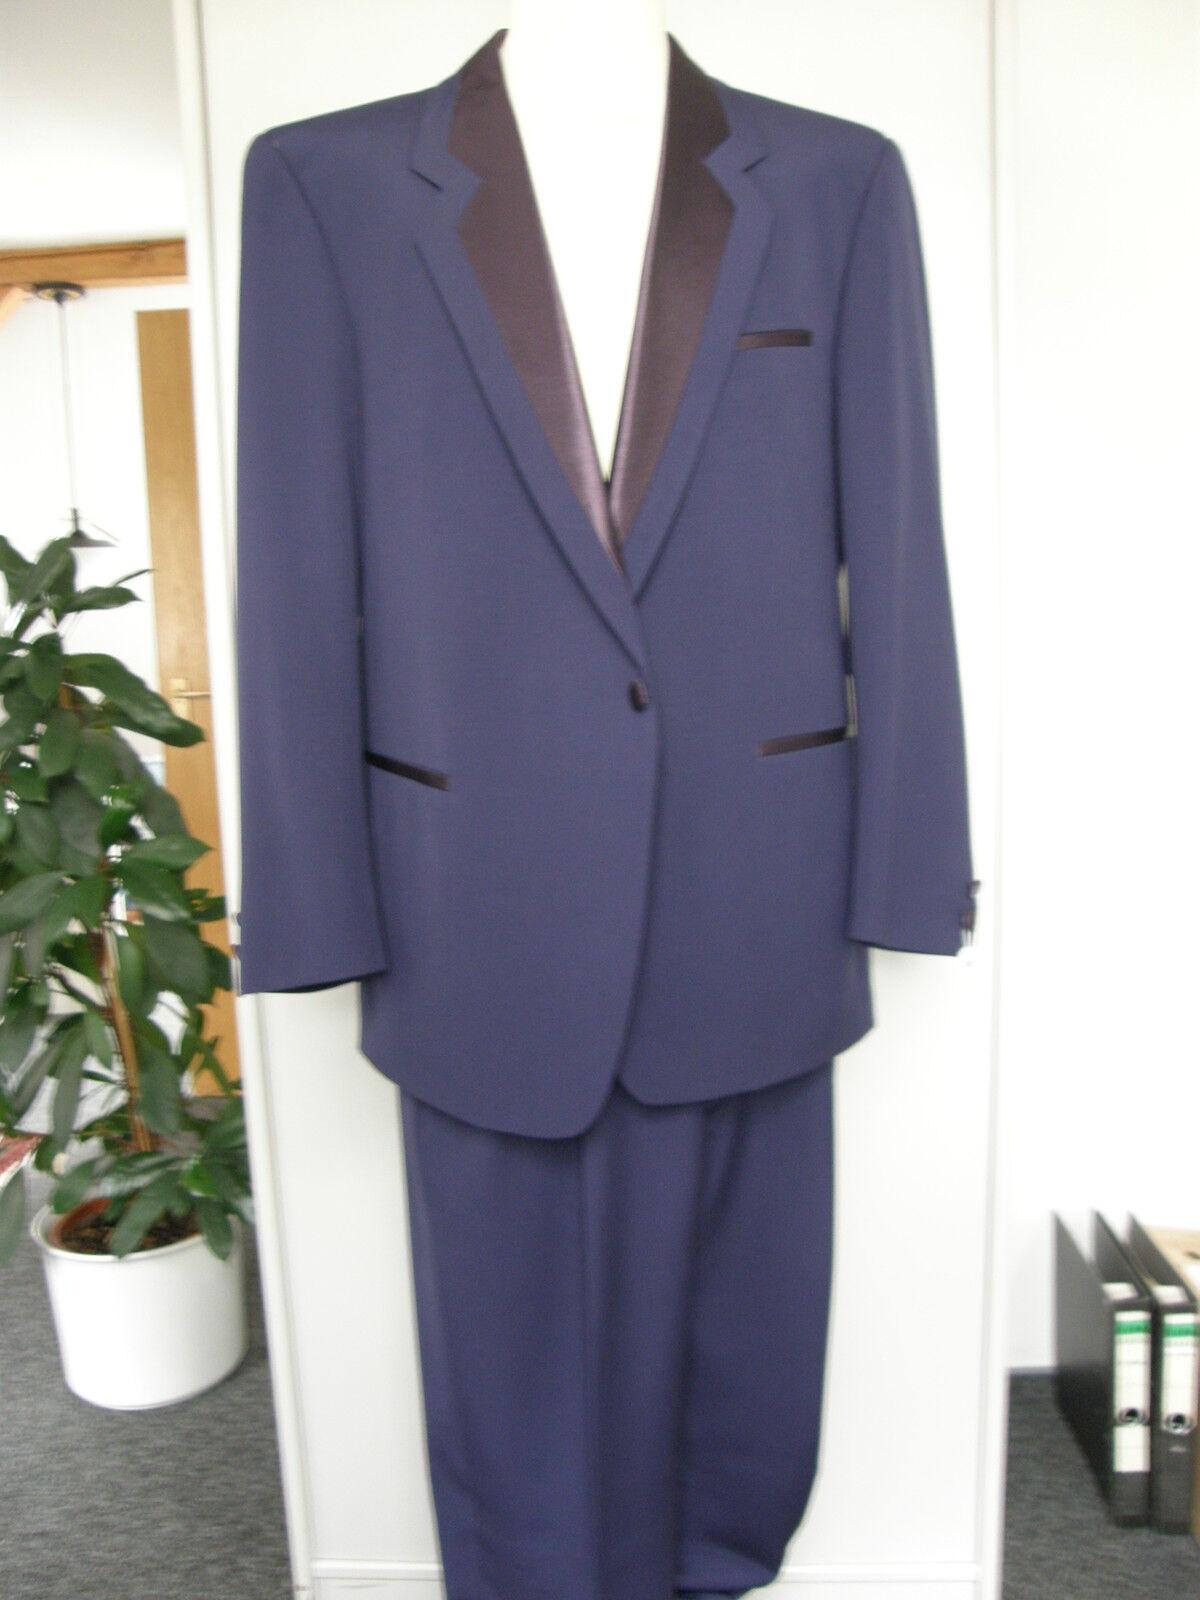 Partyanzug Licona Gesellschaftsanzug festlicher Anzug 84000 Gr. 94